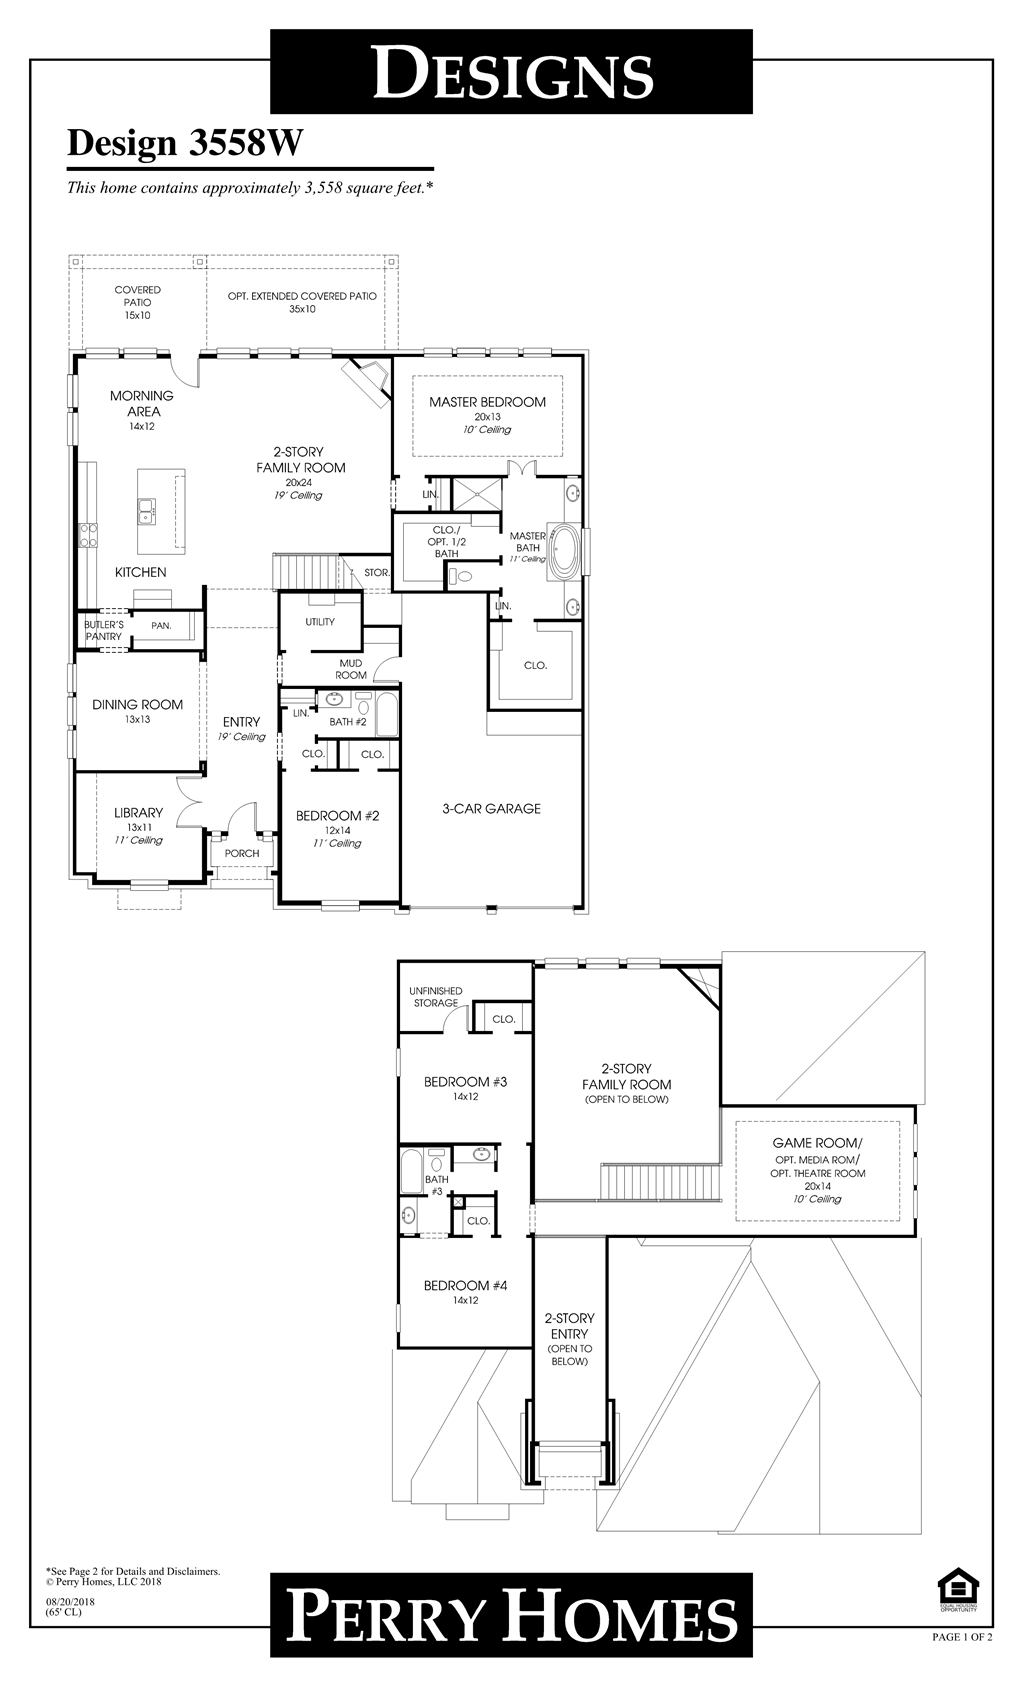 Floor Plan for 3558W